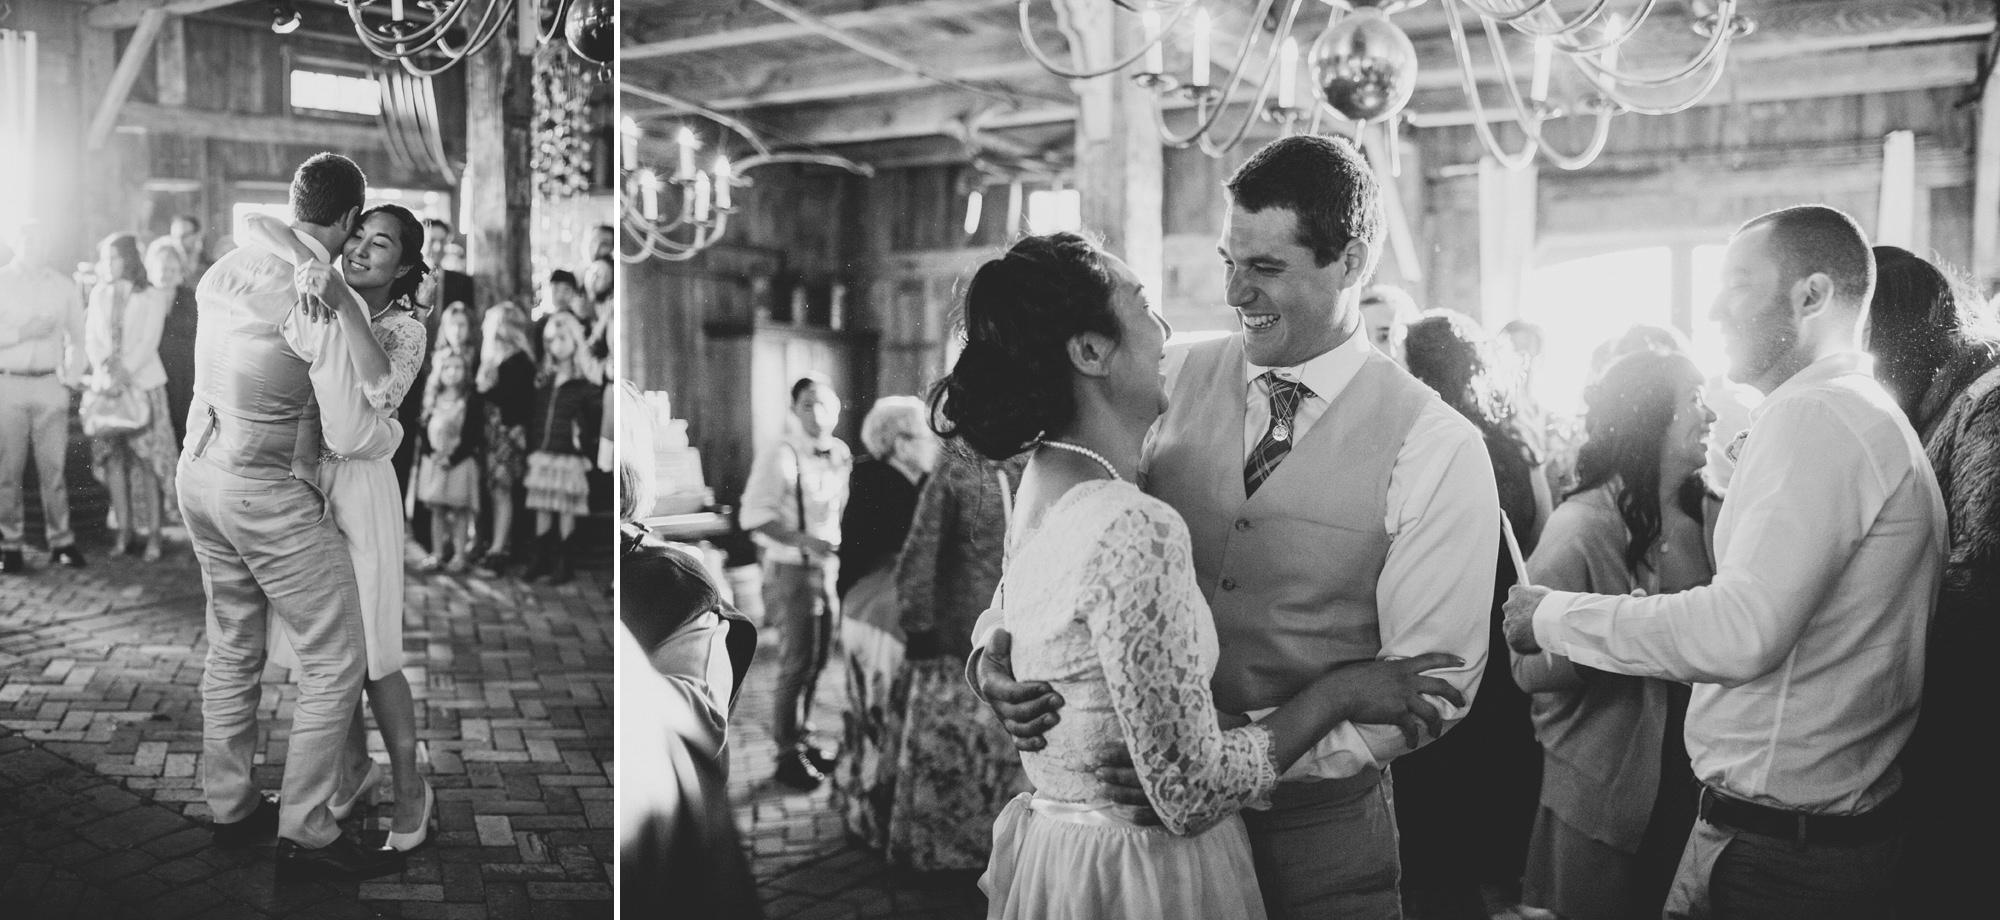 Wedding in Spring Ranch ©Anne-Claire Brun 0048